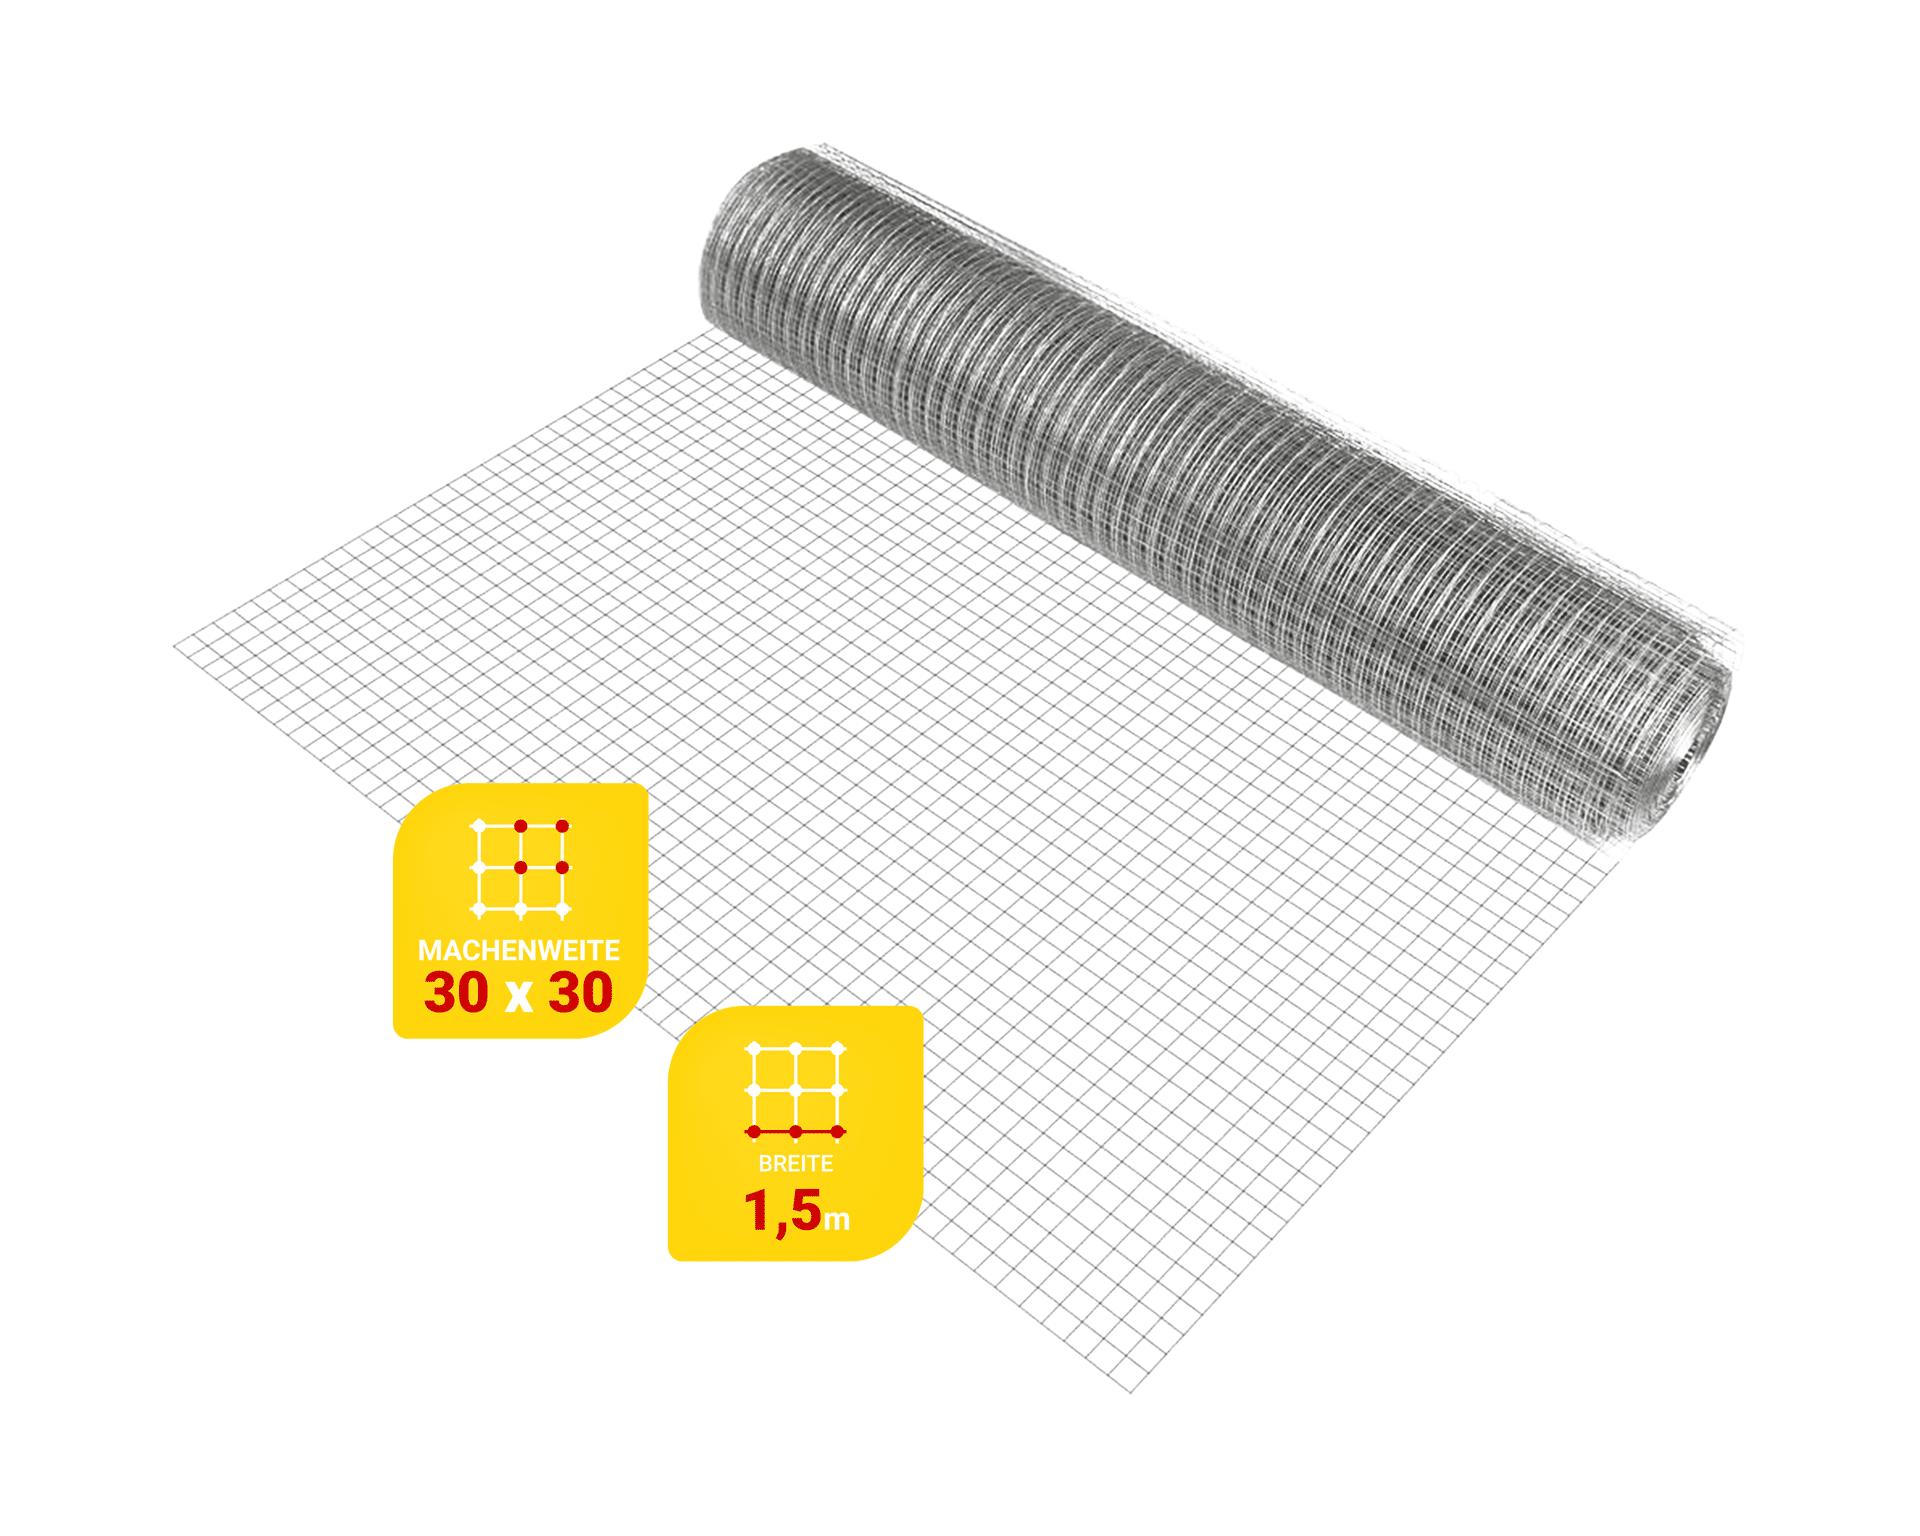 Edelstahlgitter Maschenweite 30 mm, Drahtstärke 1.0 mm, Breite 1.5 m, - Zuschnitt